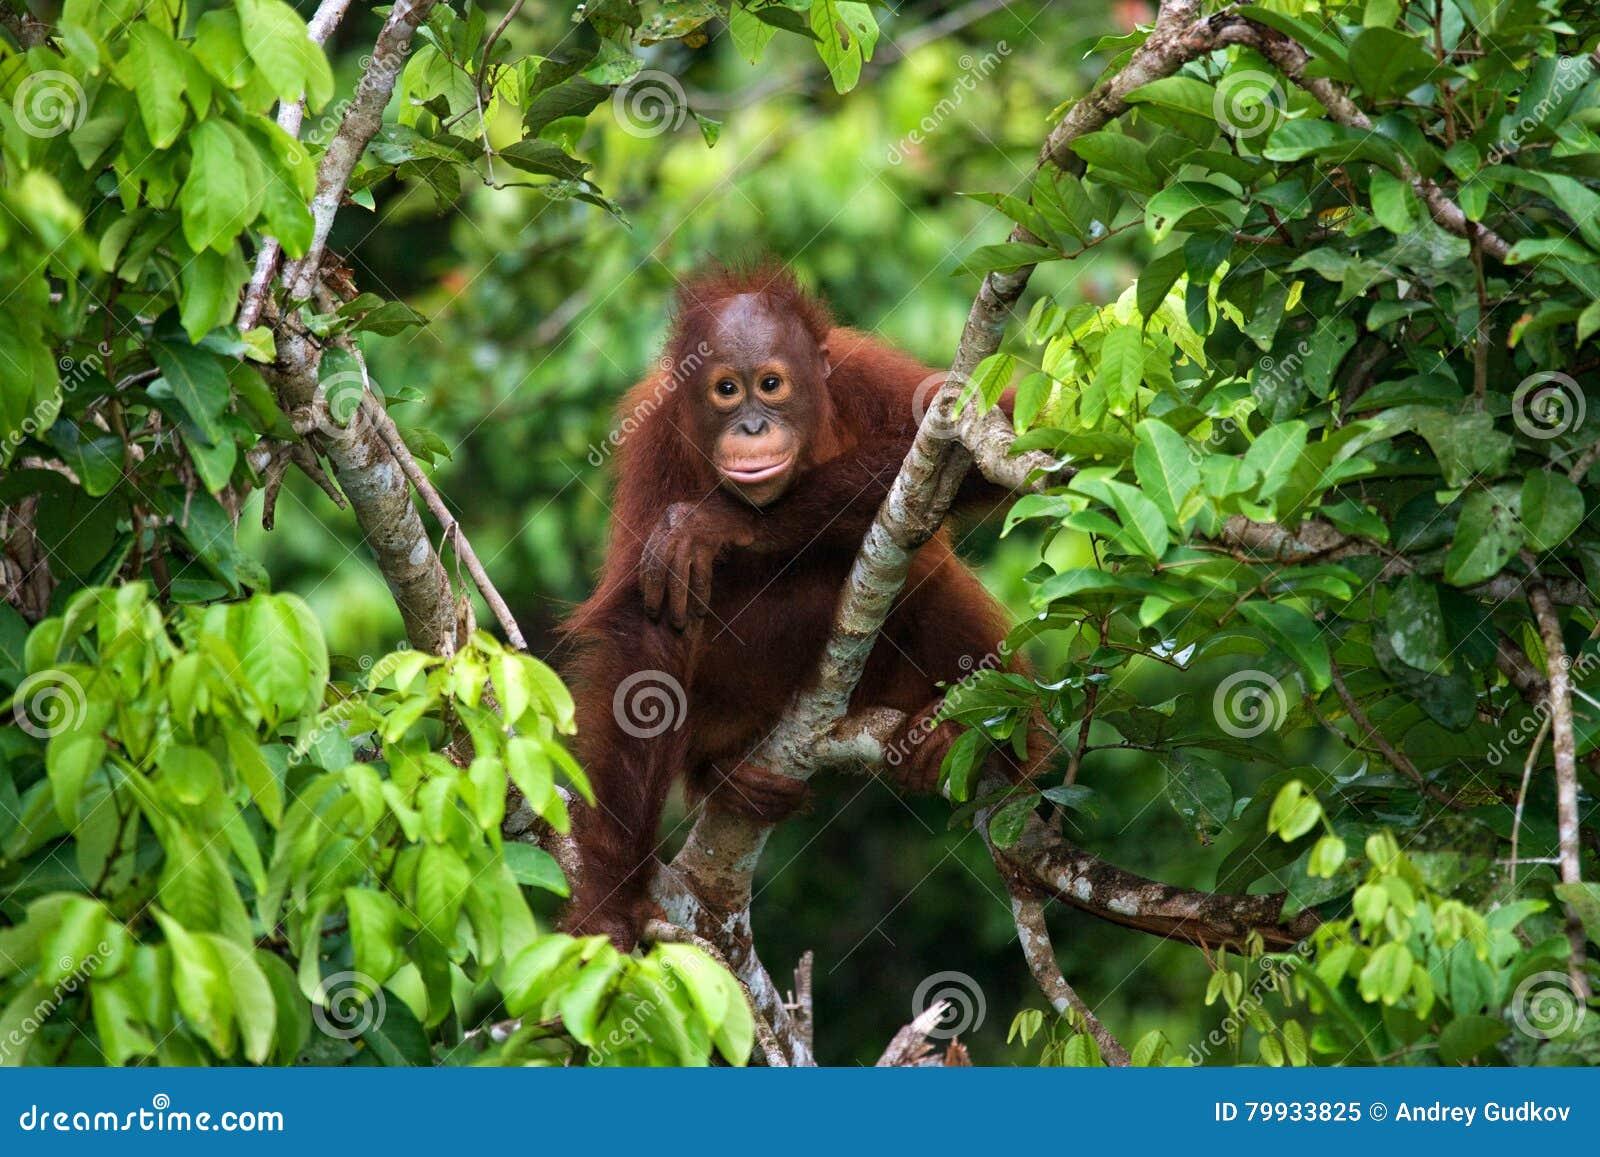 A baby orangutan in the wild. Indonesia. The island of Kalimantan (Borneo).